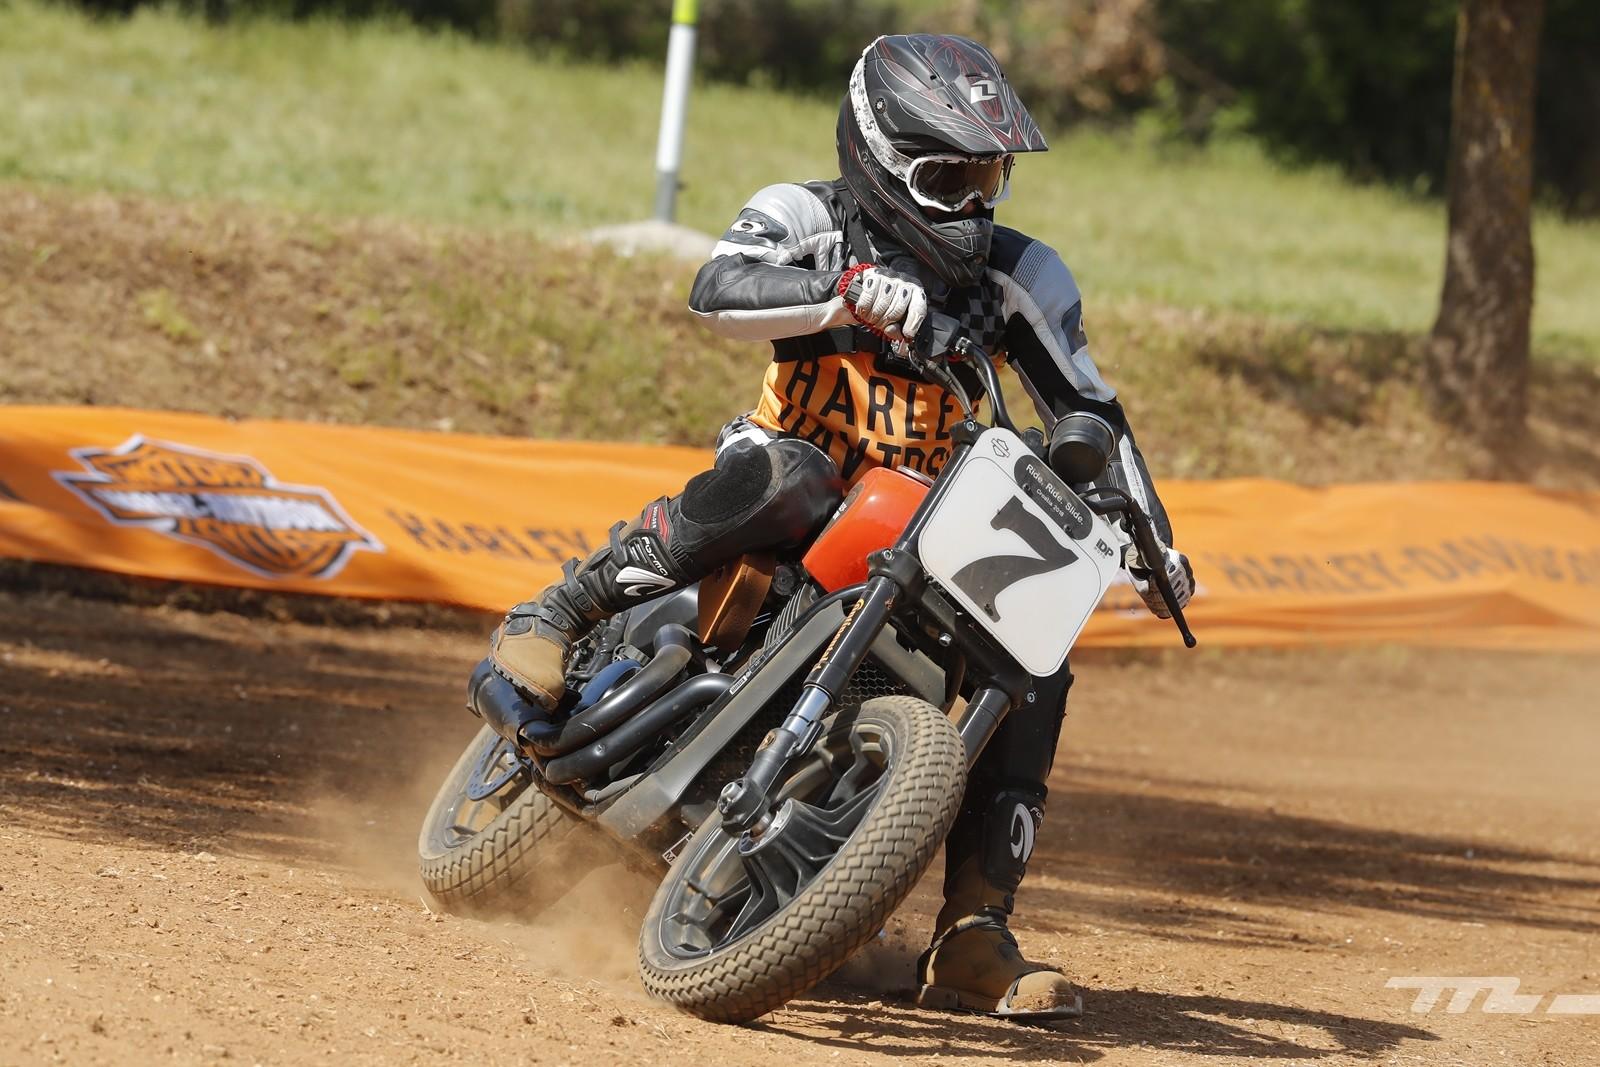 Foto de Harley-Davidson Ride Ride Slide 2018 (42/82)